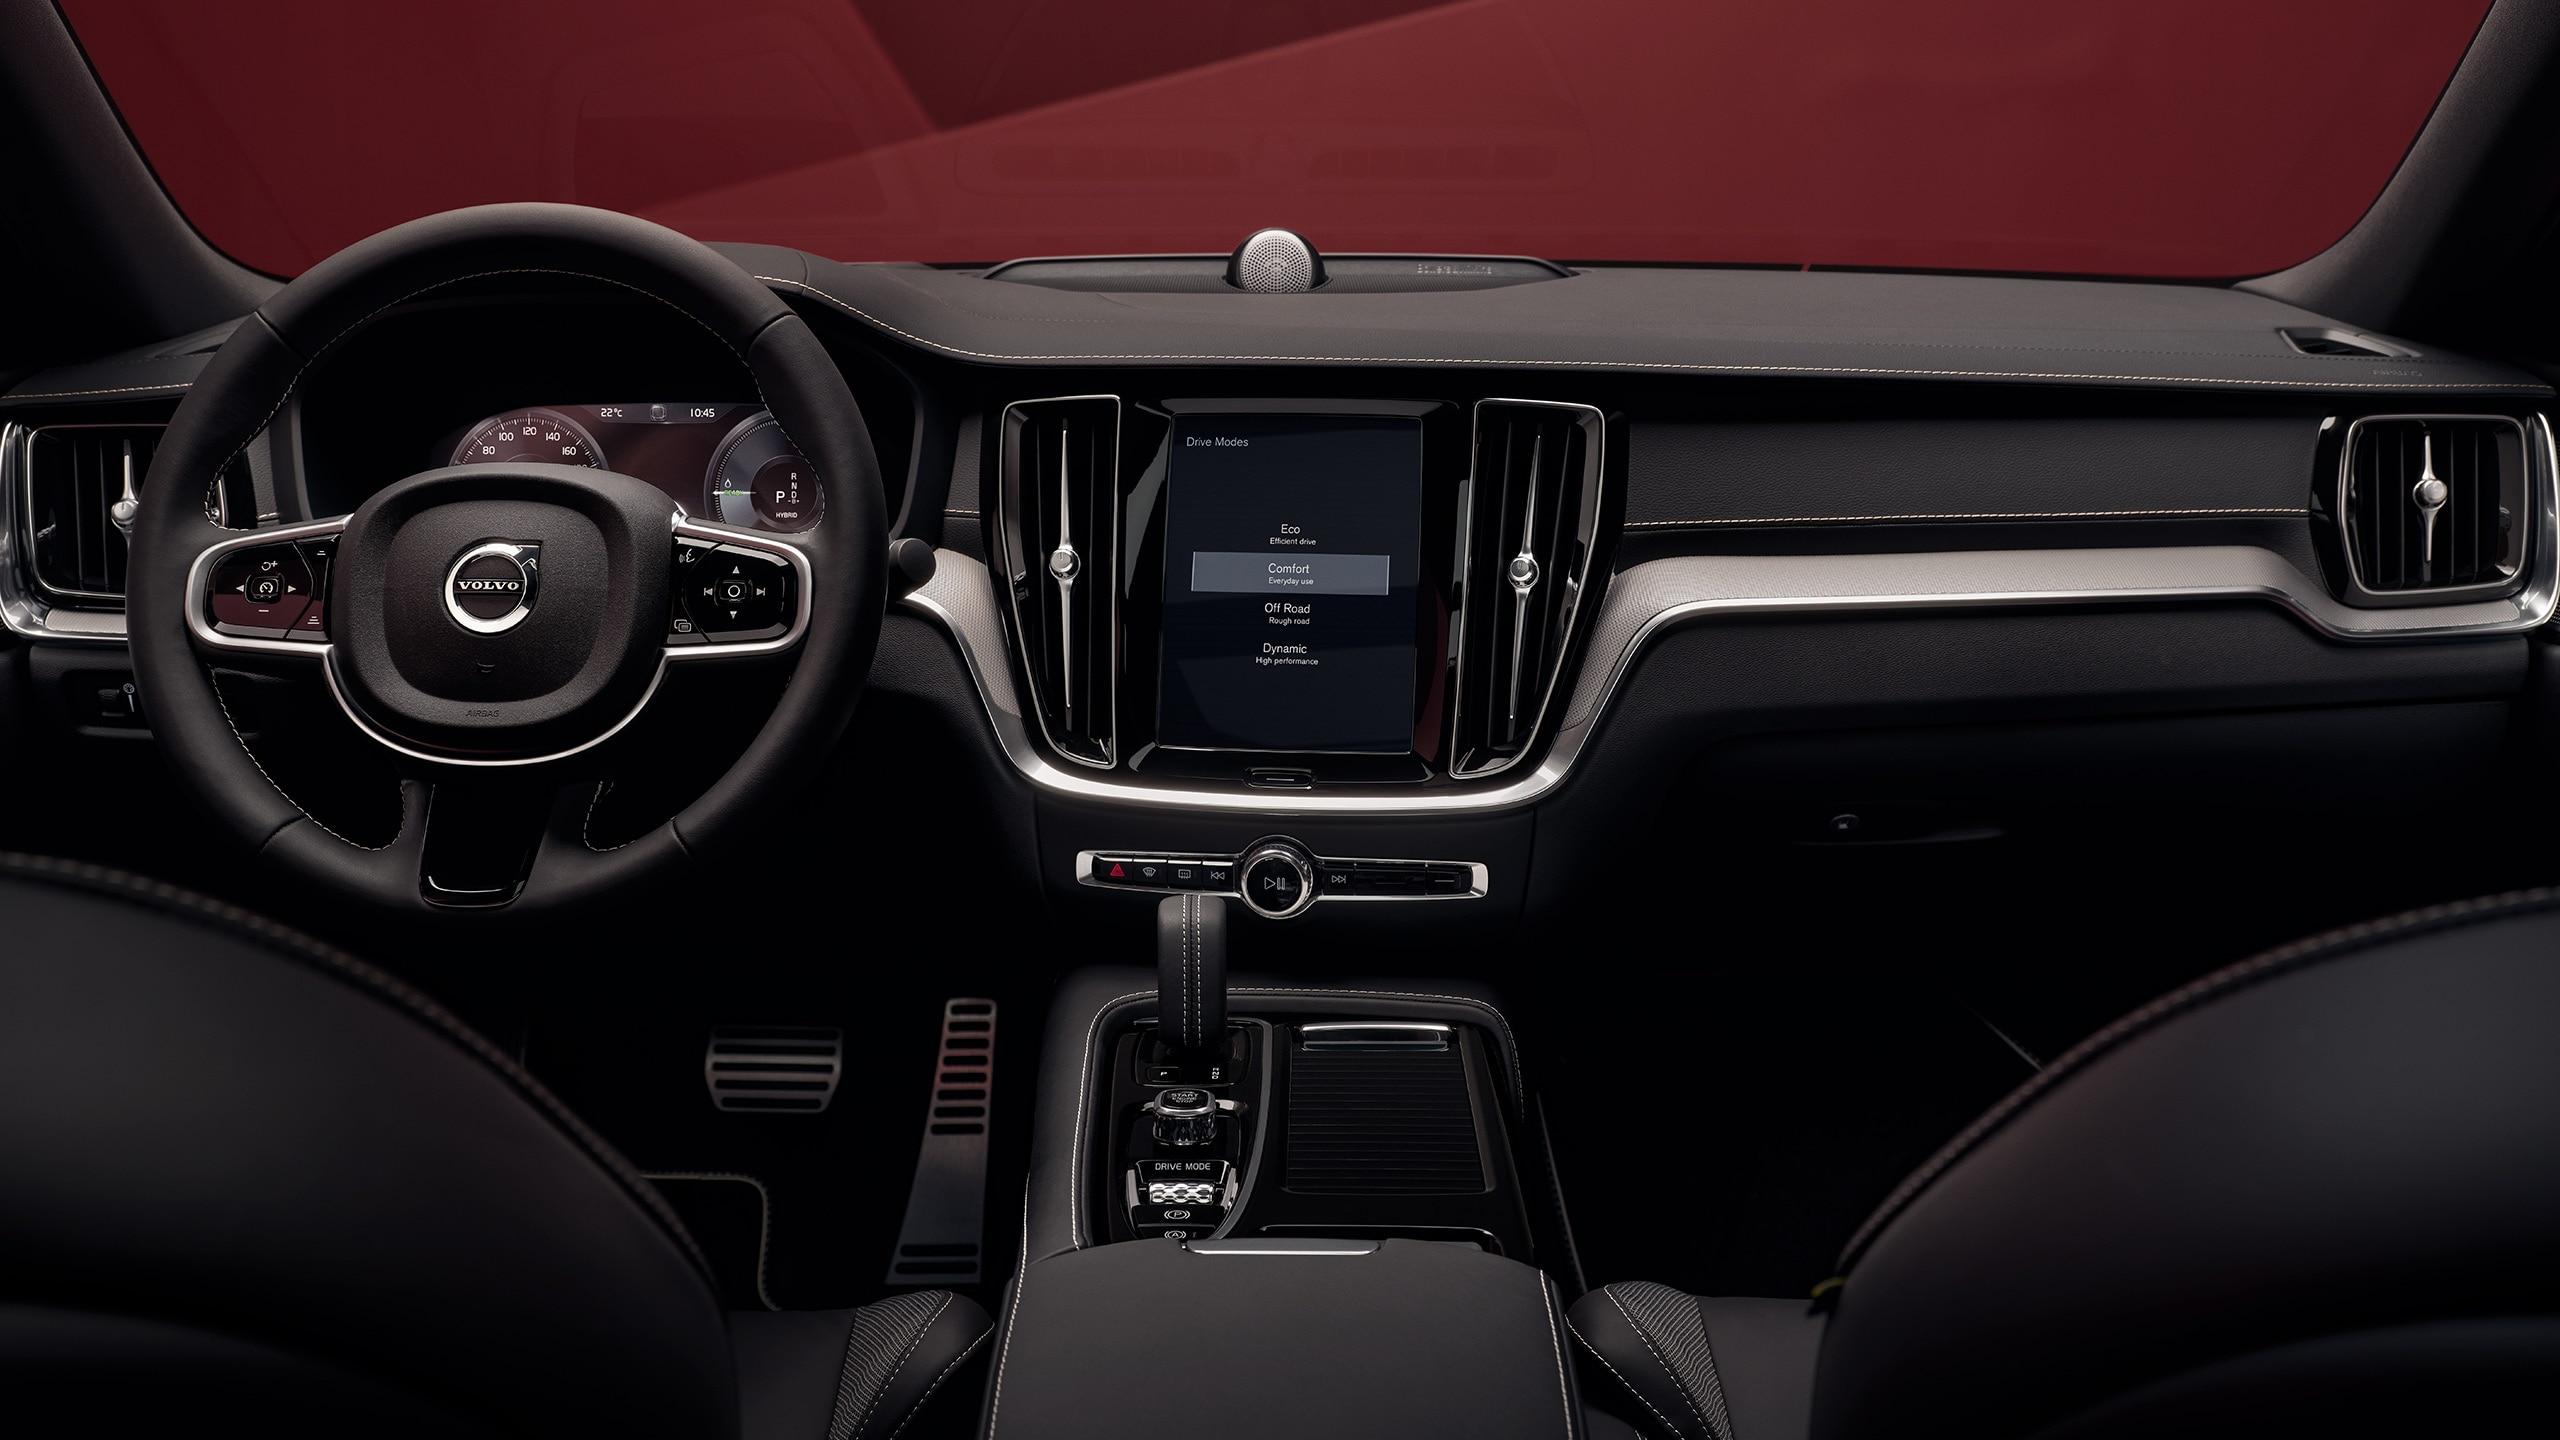 Black interior of a Volvo S60 Sedan